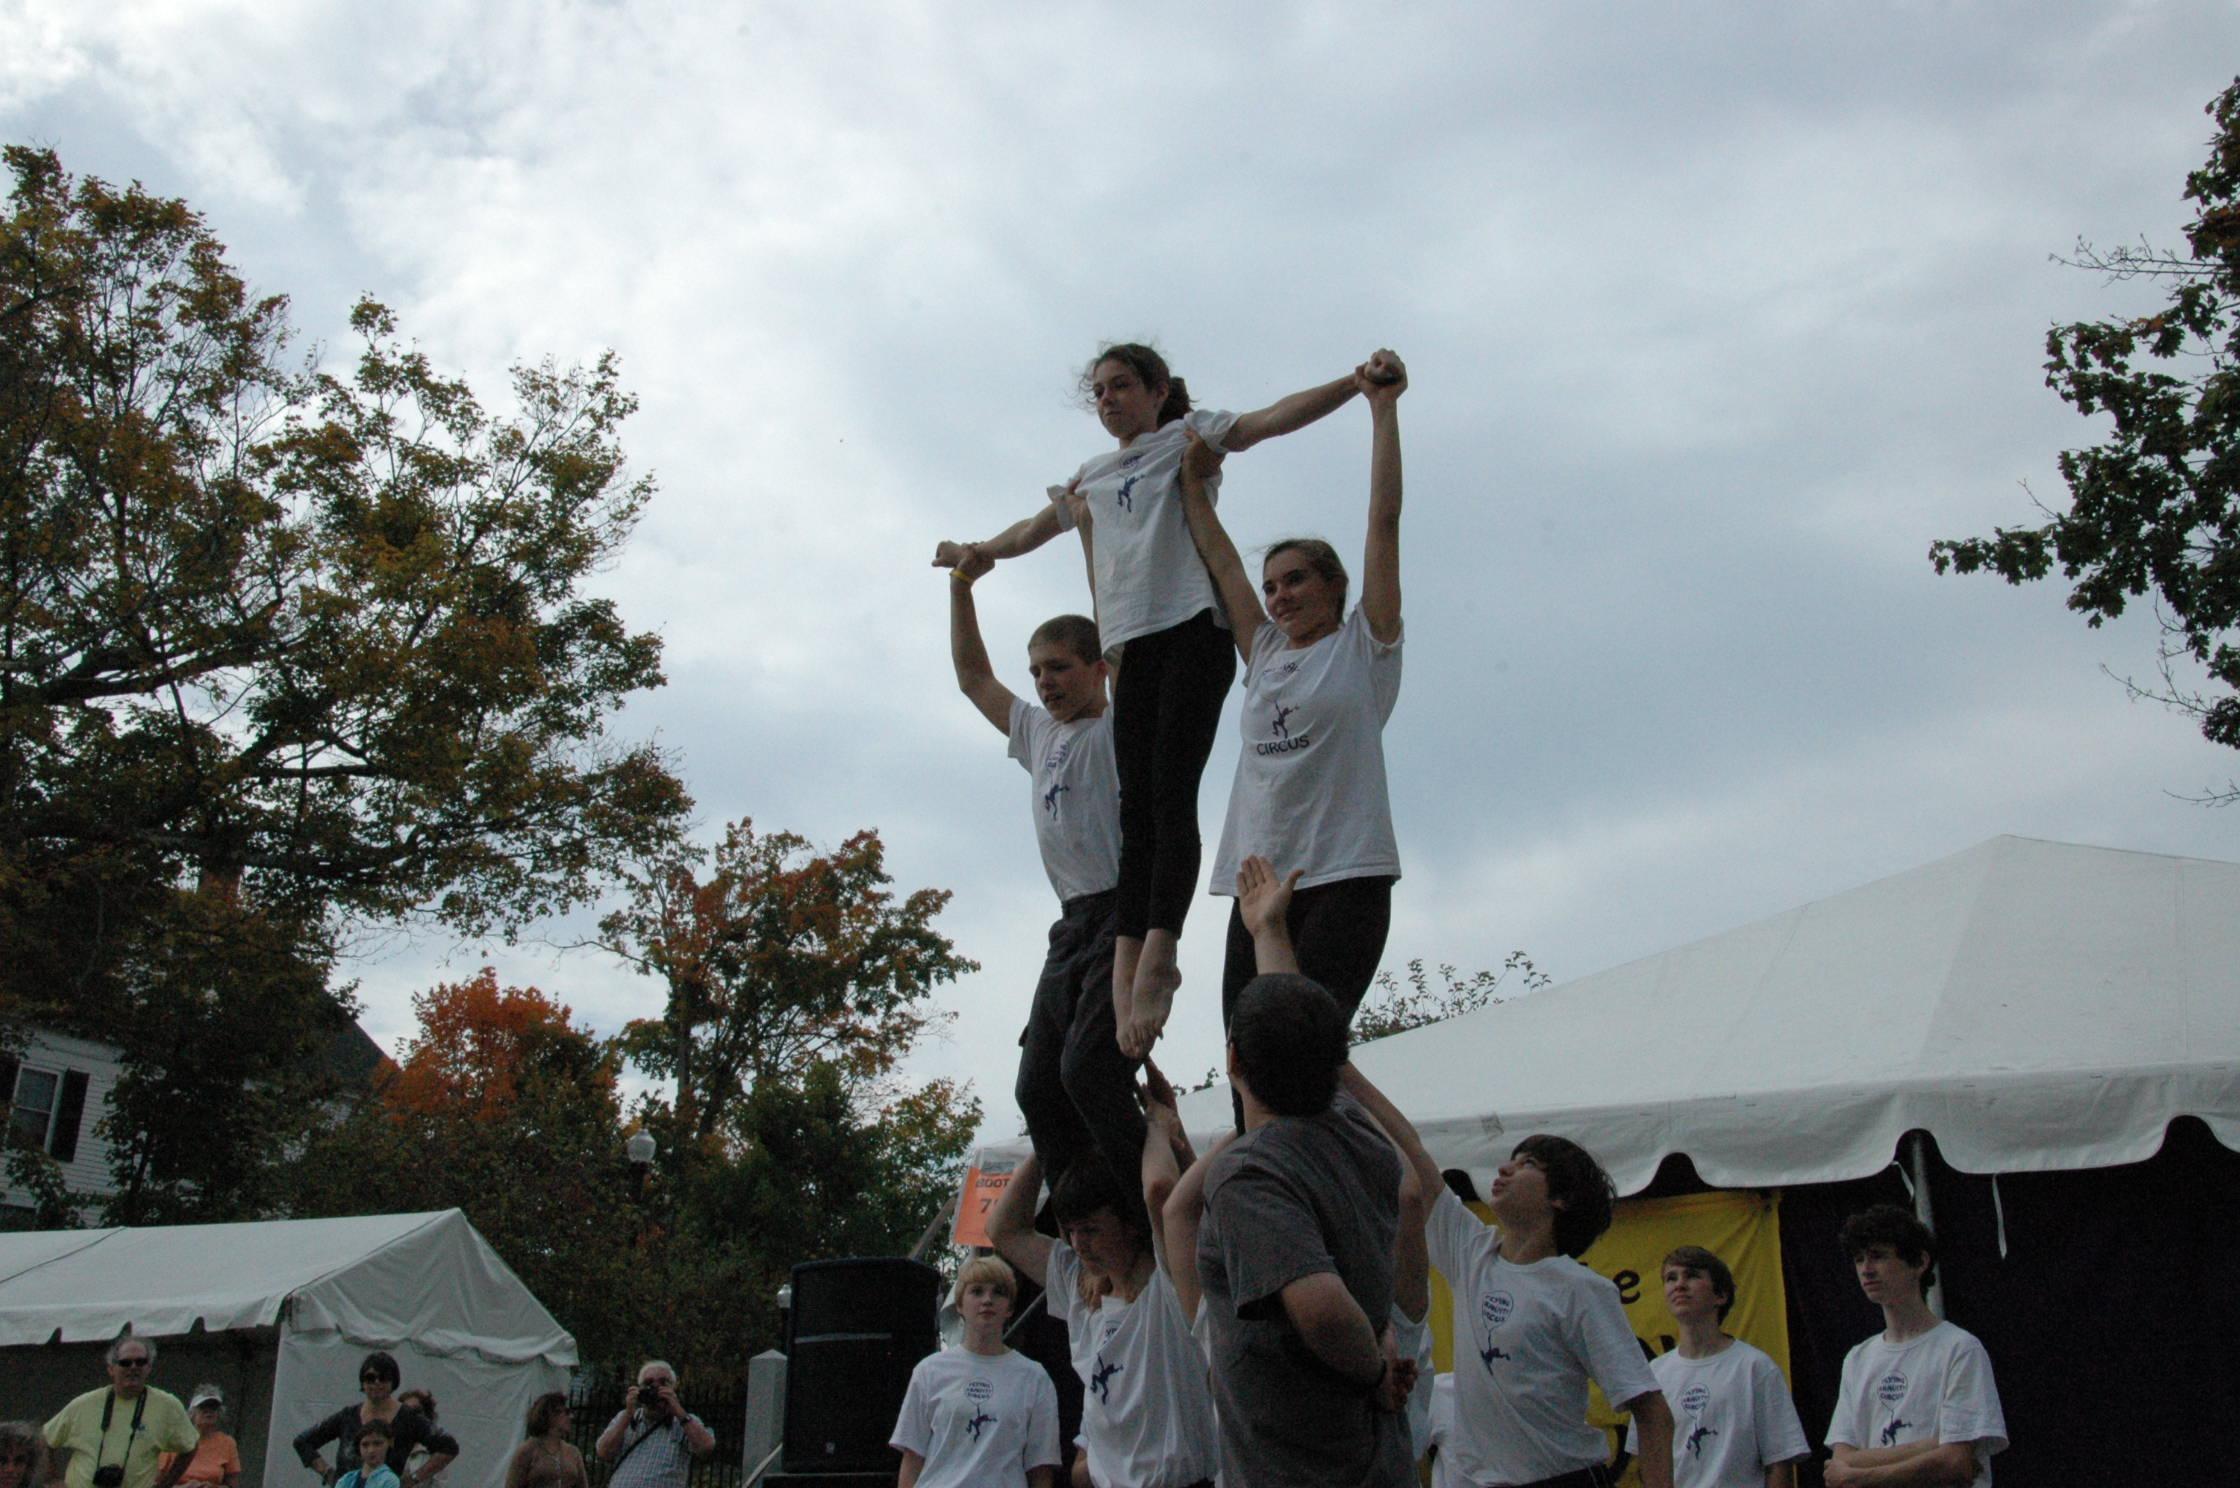 2012-10-06 Flyin Gravity Circus - Pumpkin 140.JPG